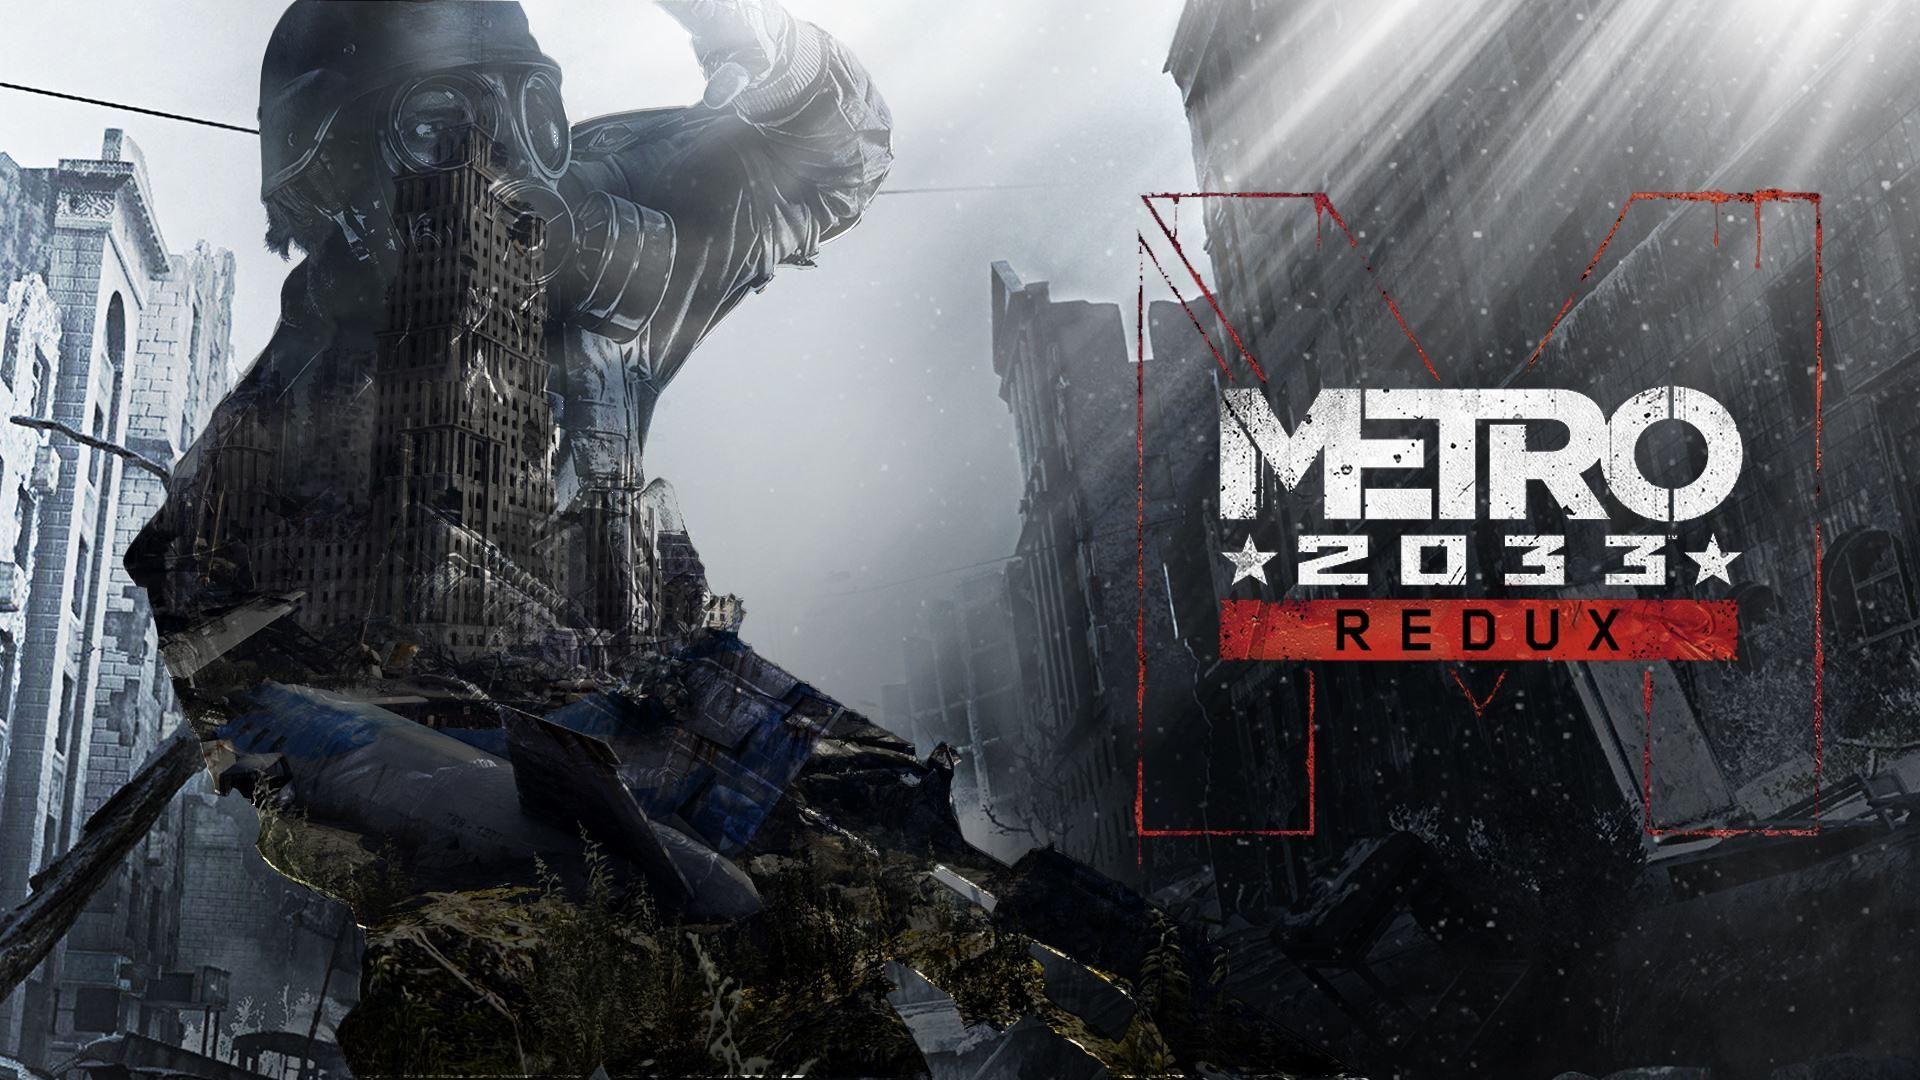 Metro 2033 Redux Double Exposure | News of video game